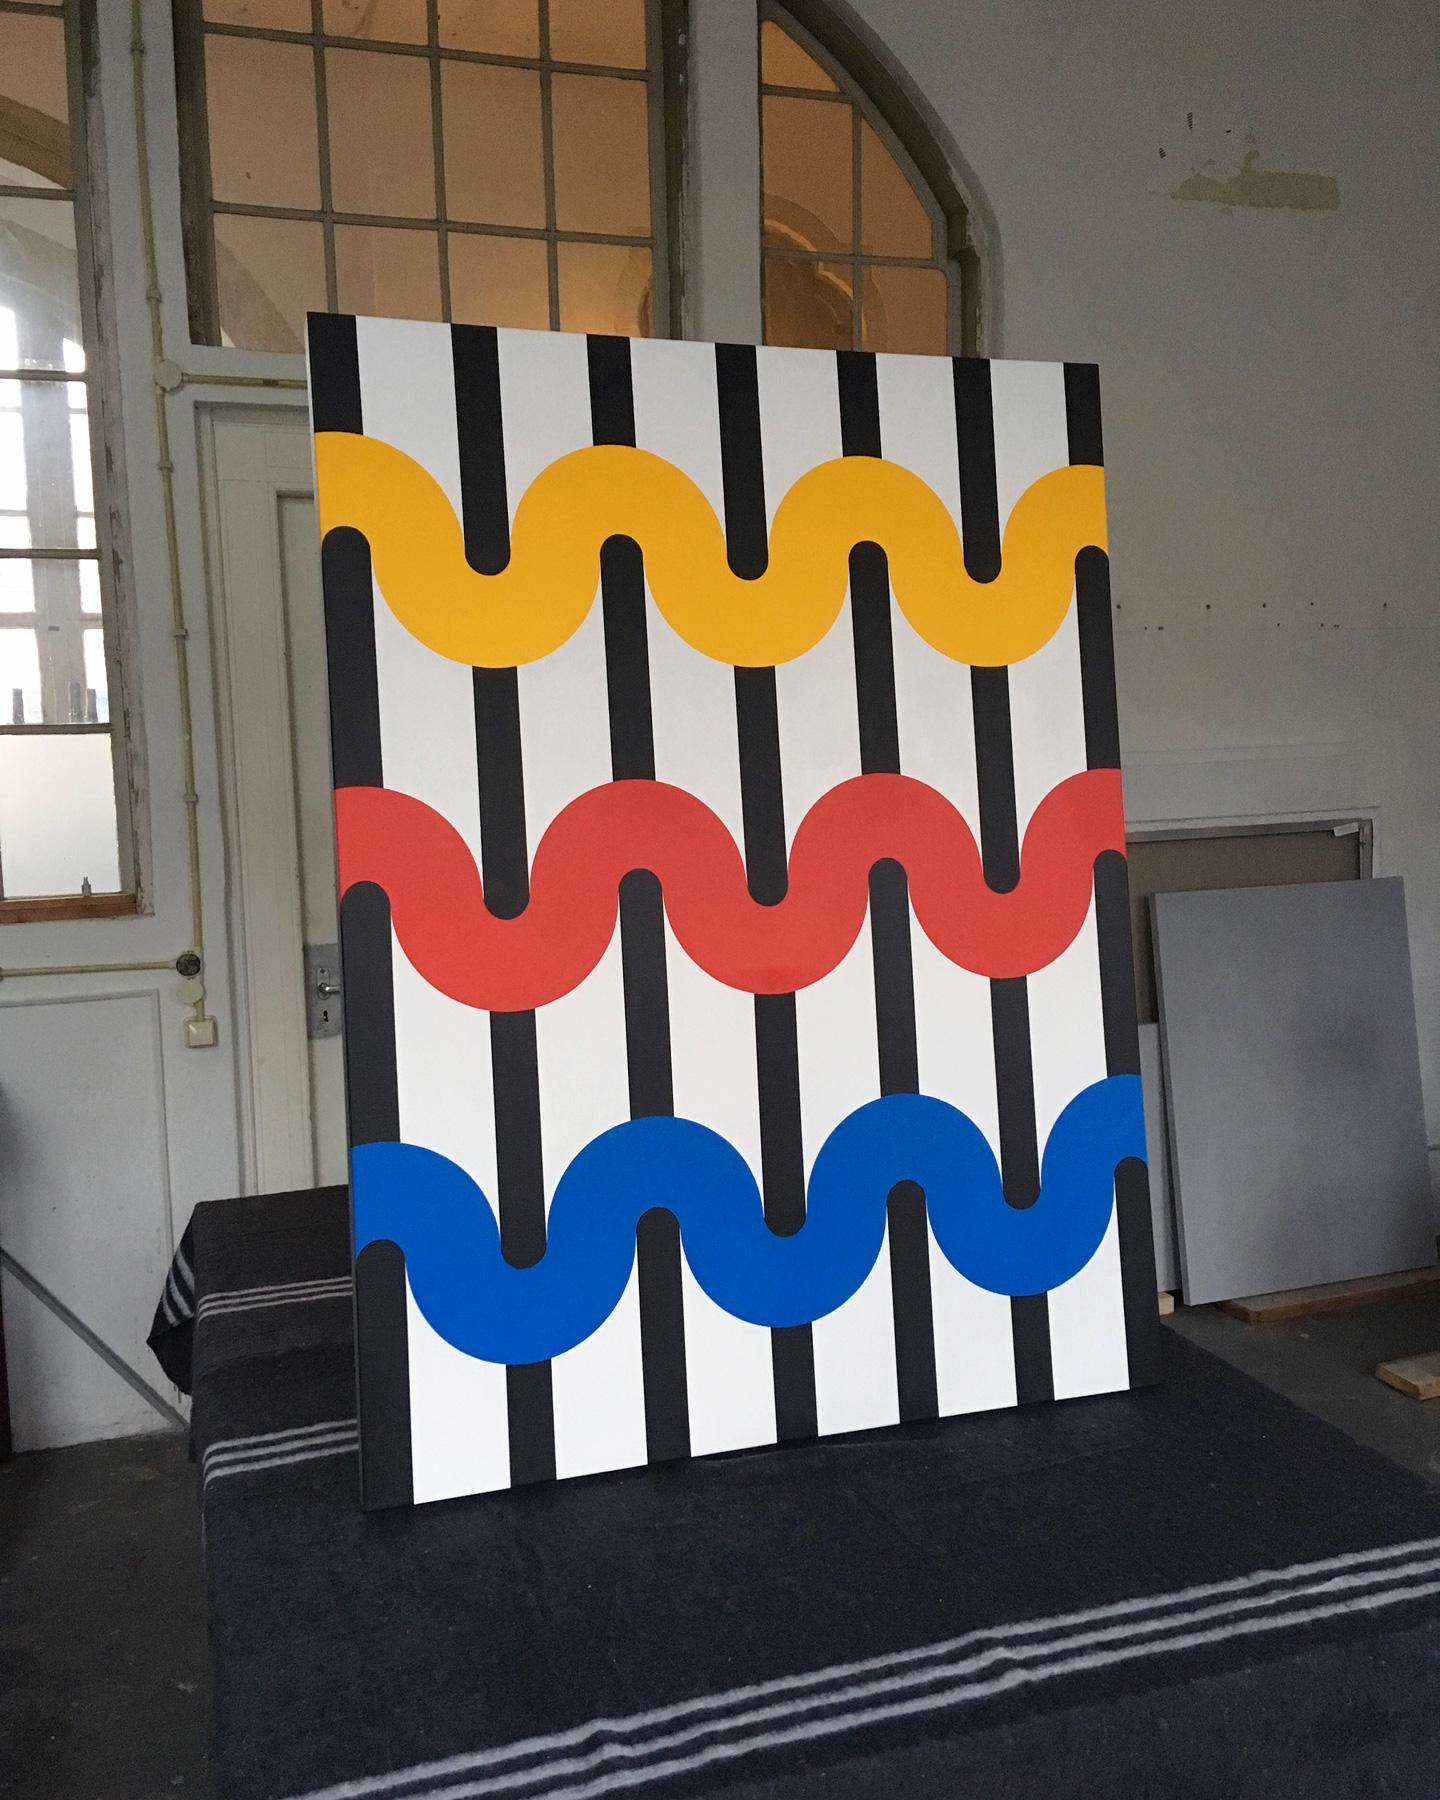 55  95 x 125 x 4,5 cm Acrylic on canvas 2017     ropp schouten